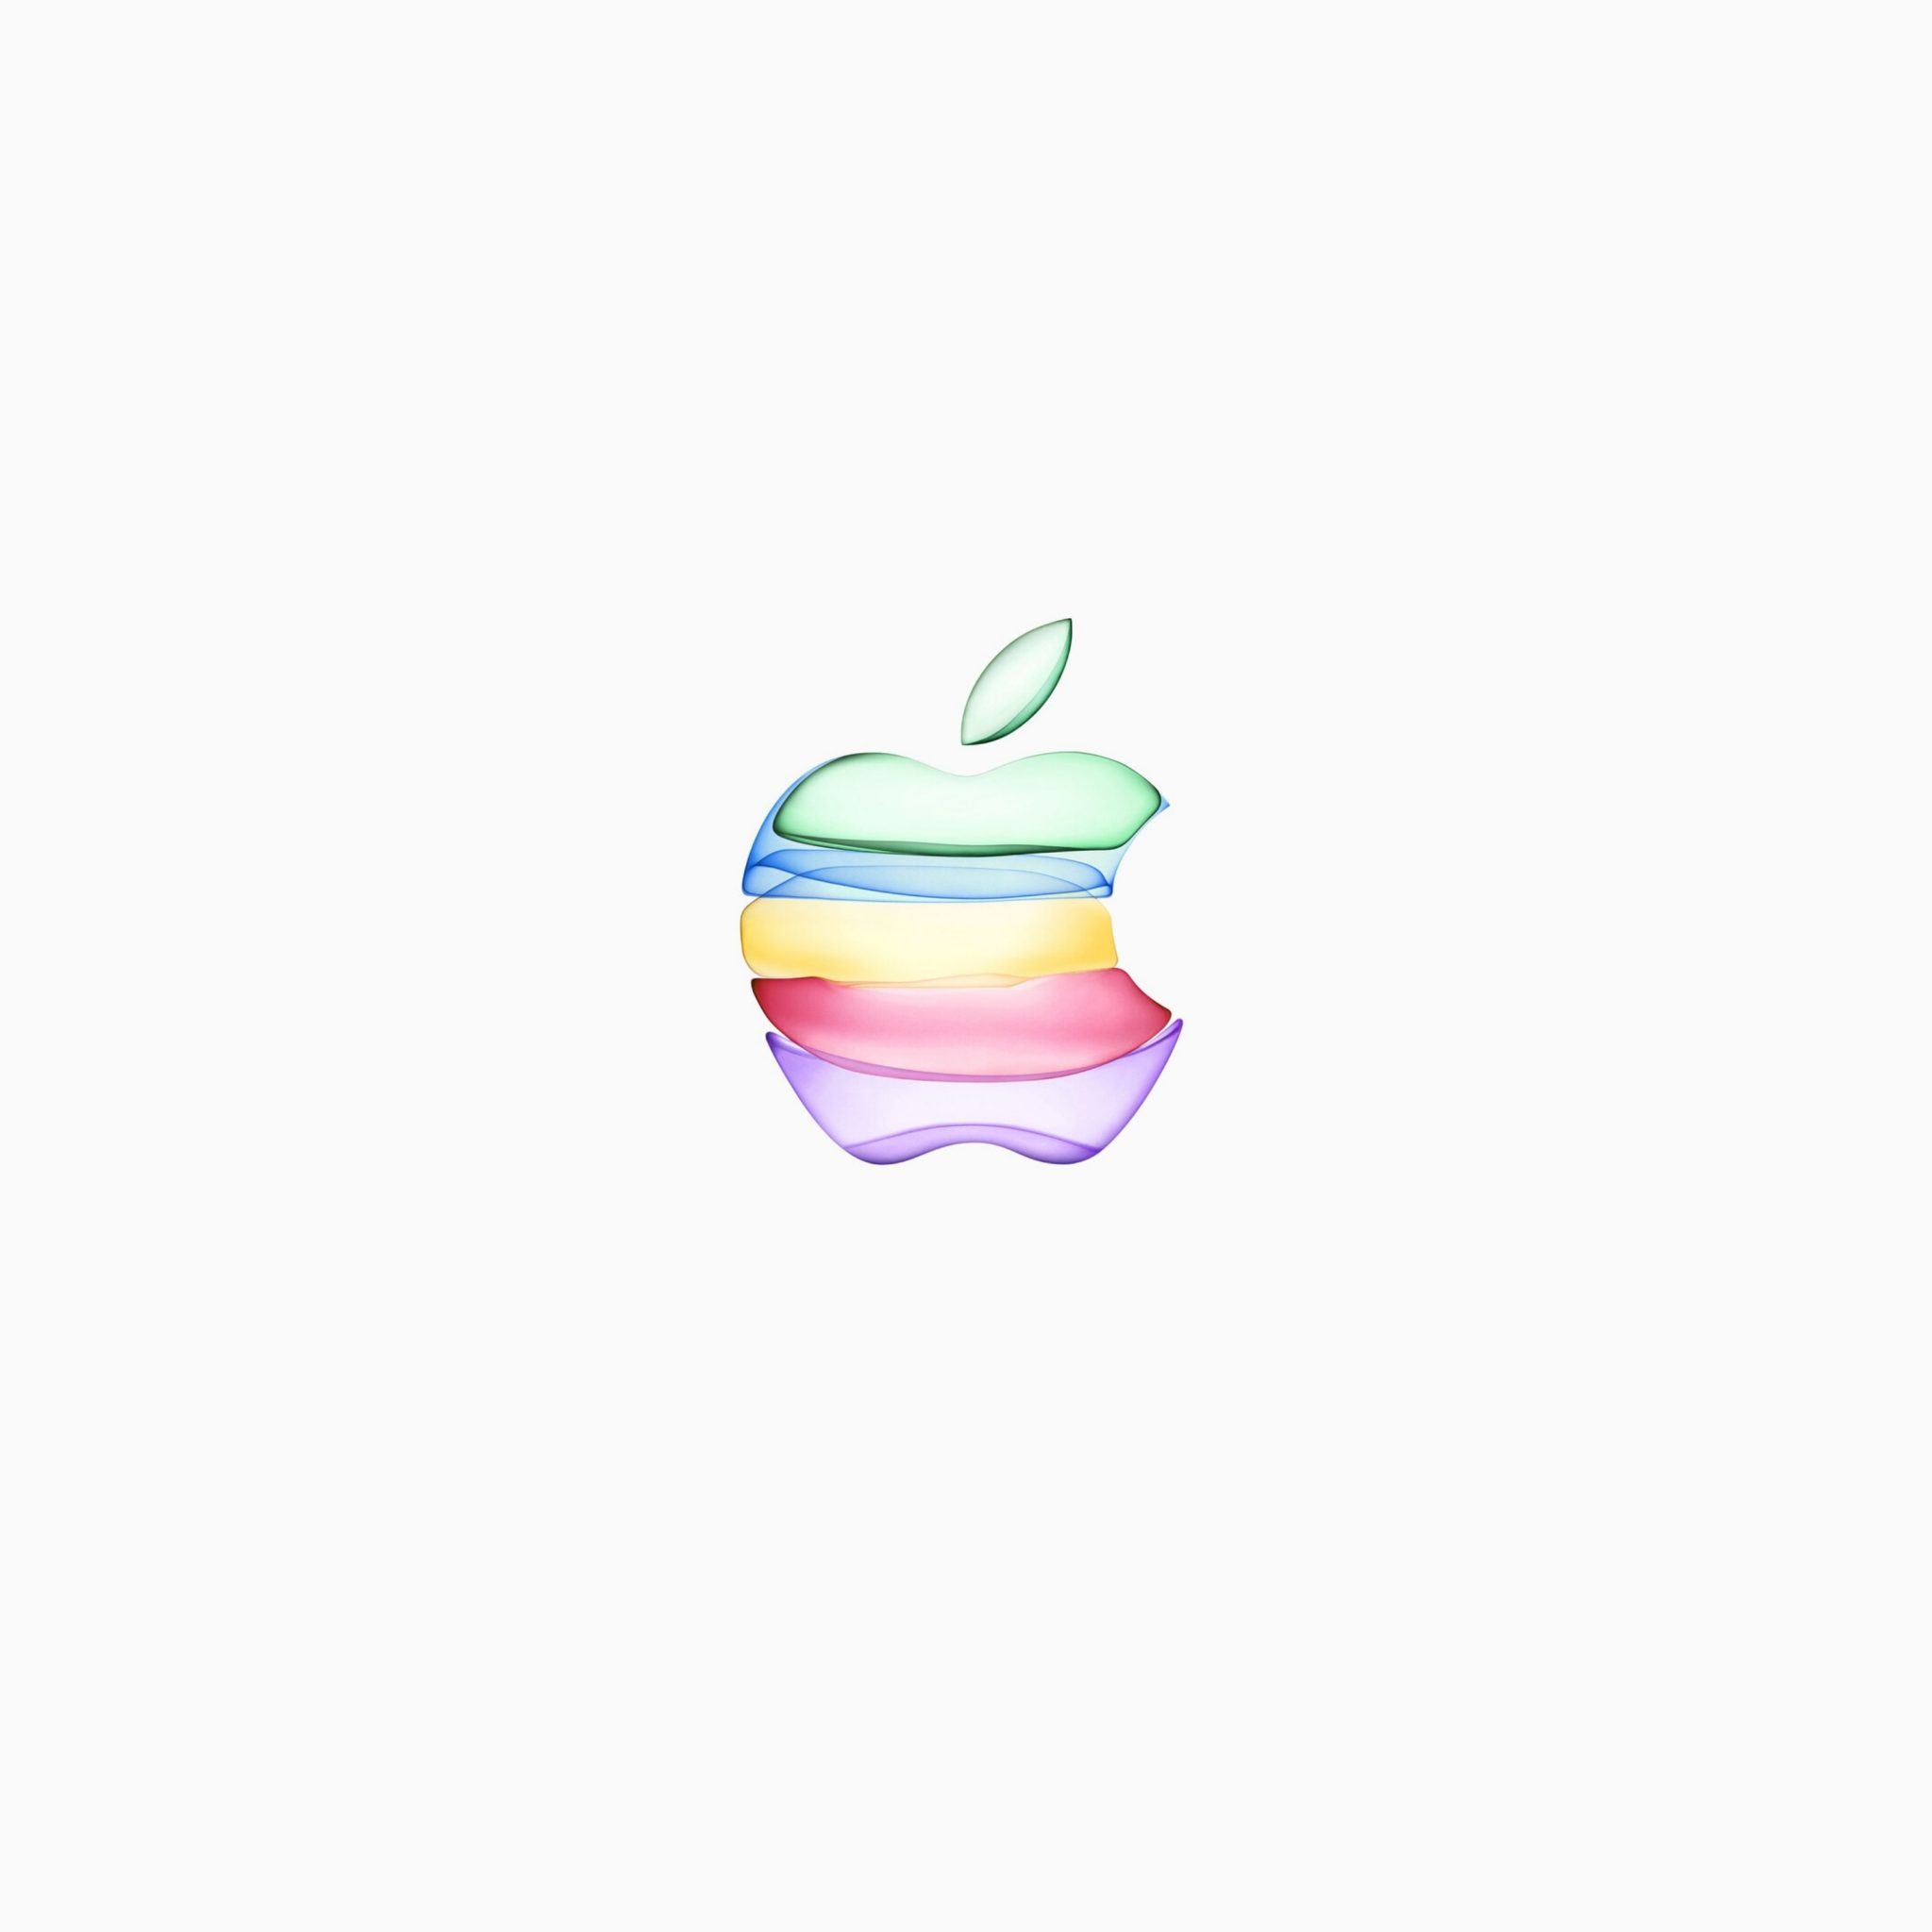 2048x2048 wallpapers iPad retina iPhone 11 Apple Logo White Background iPad Wallpaper 2048x2048 pixels resolution